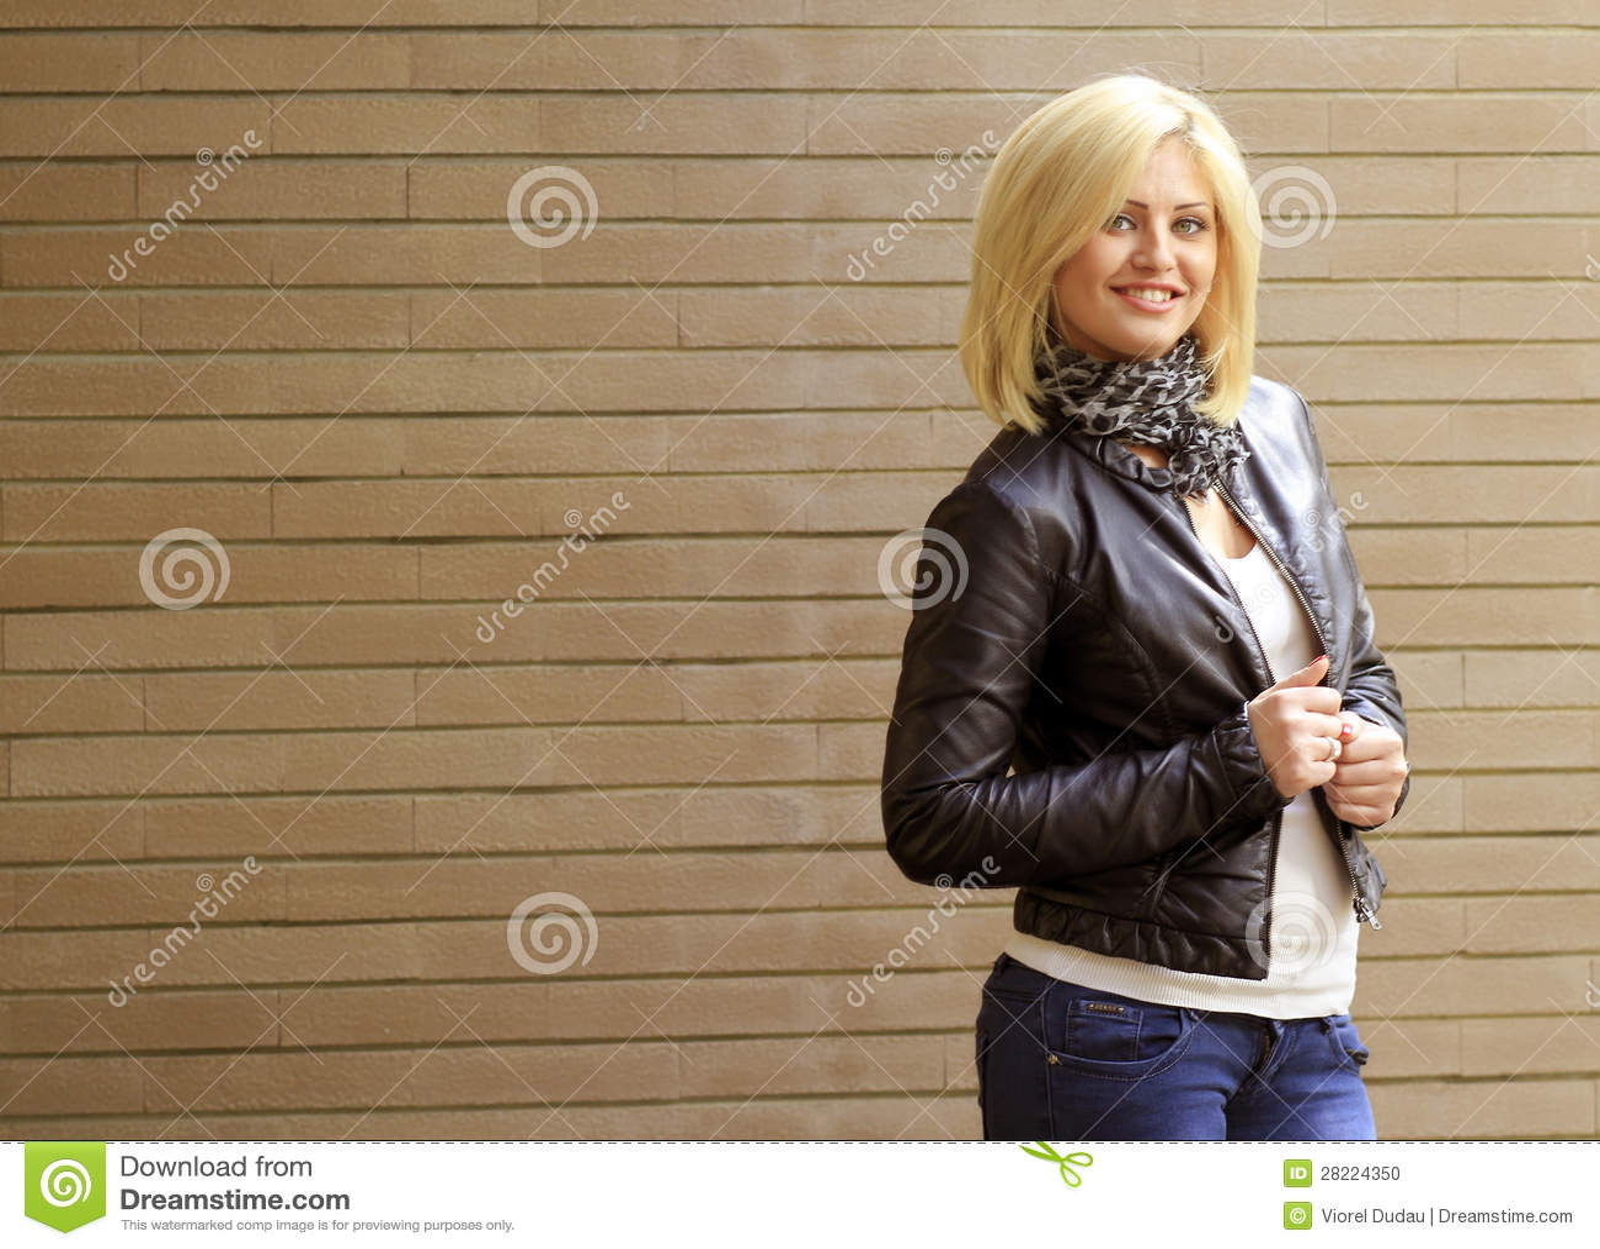 Mulher loura de sorriso